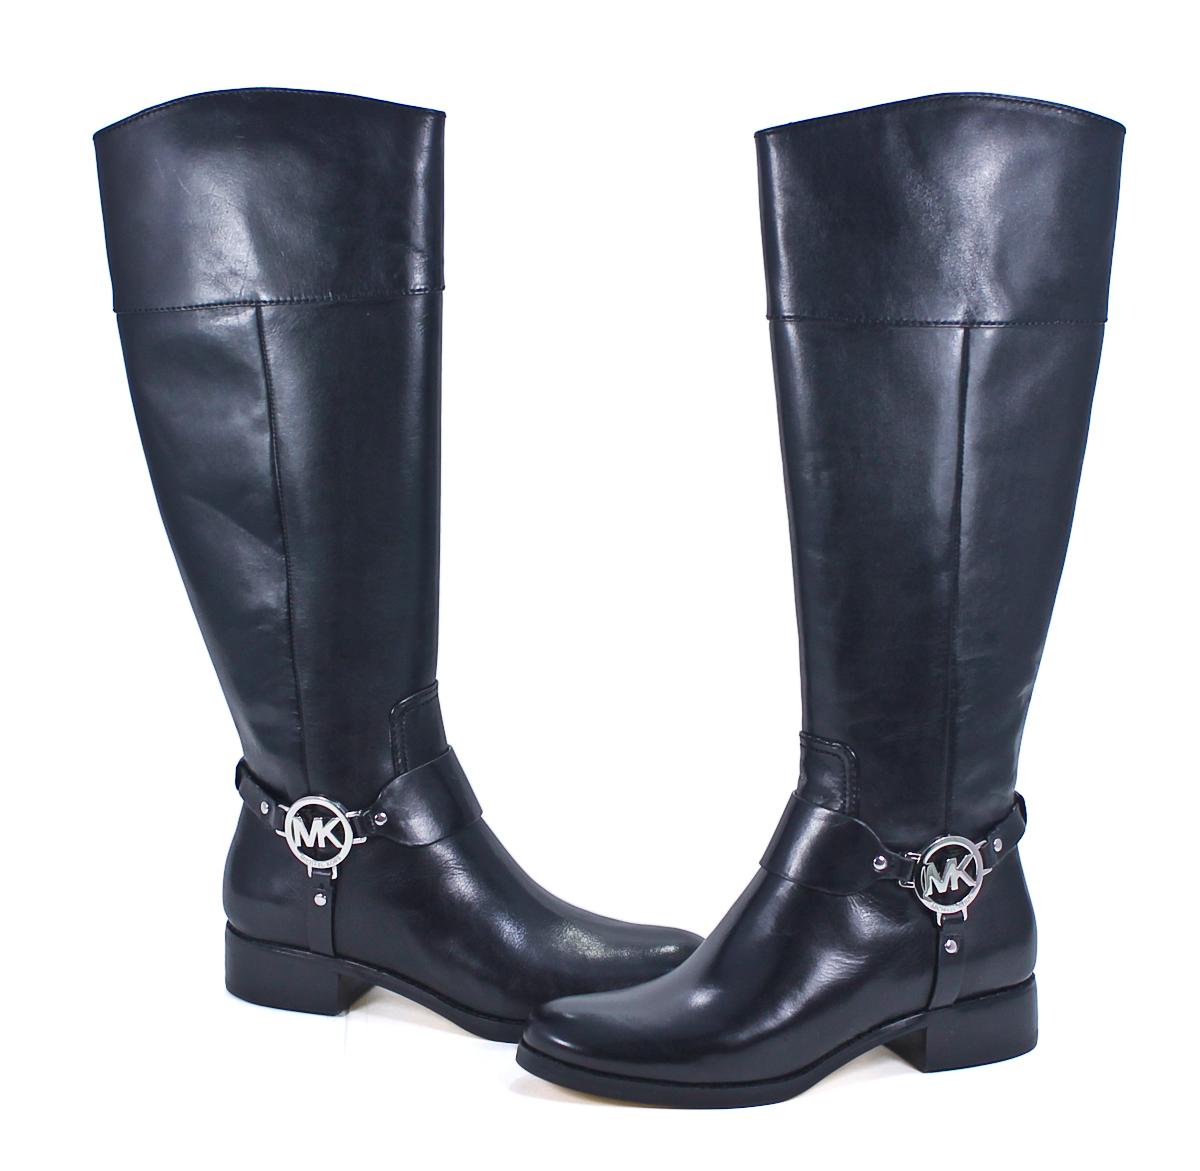 Michael Kors Fulton Harness Boot Black Leather Knee High ...